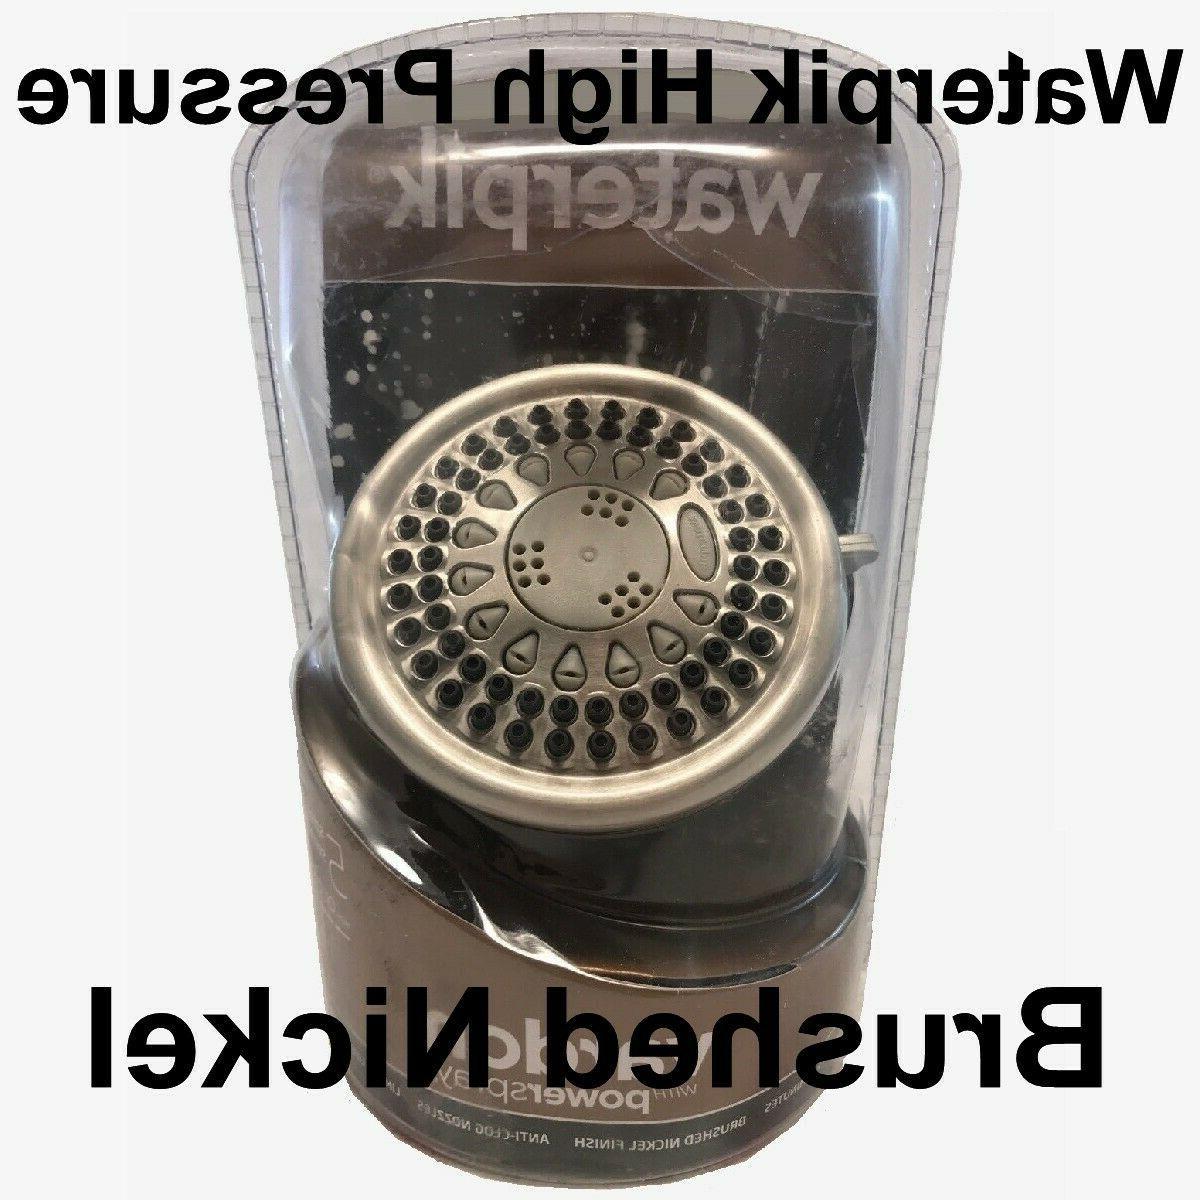 vardon 5 showerhead brushed nickel